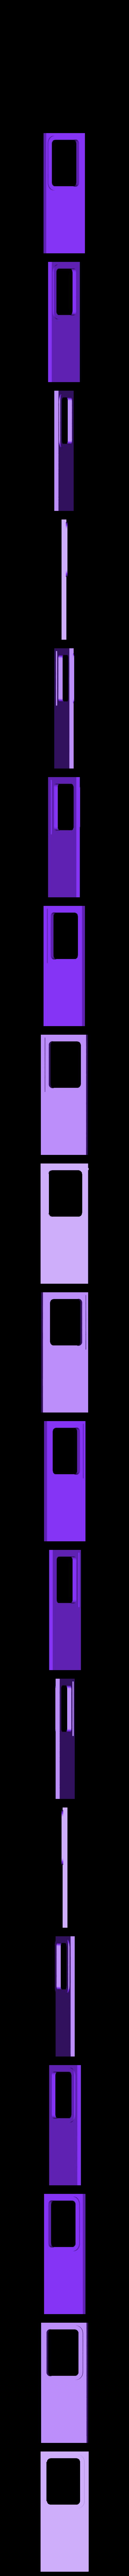 G porte cabine.STL Download STL file Draisine Matisa for LGB • 3D printable object, biddle